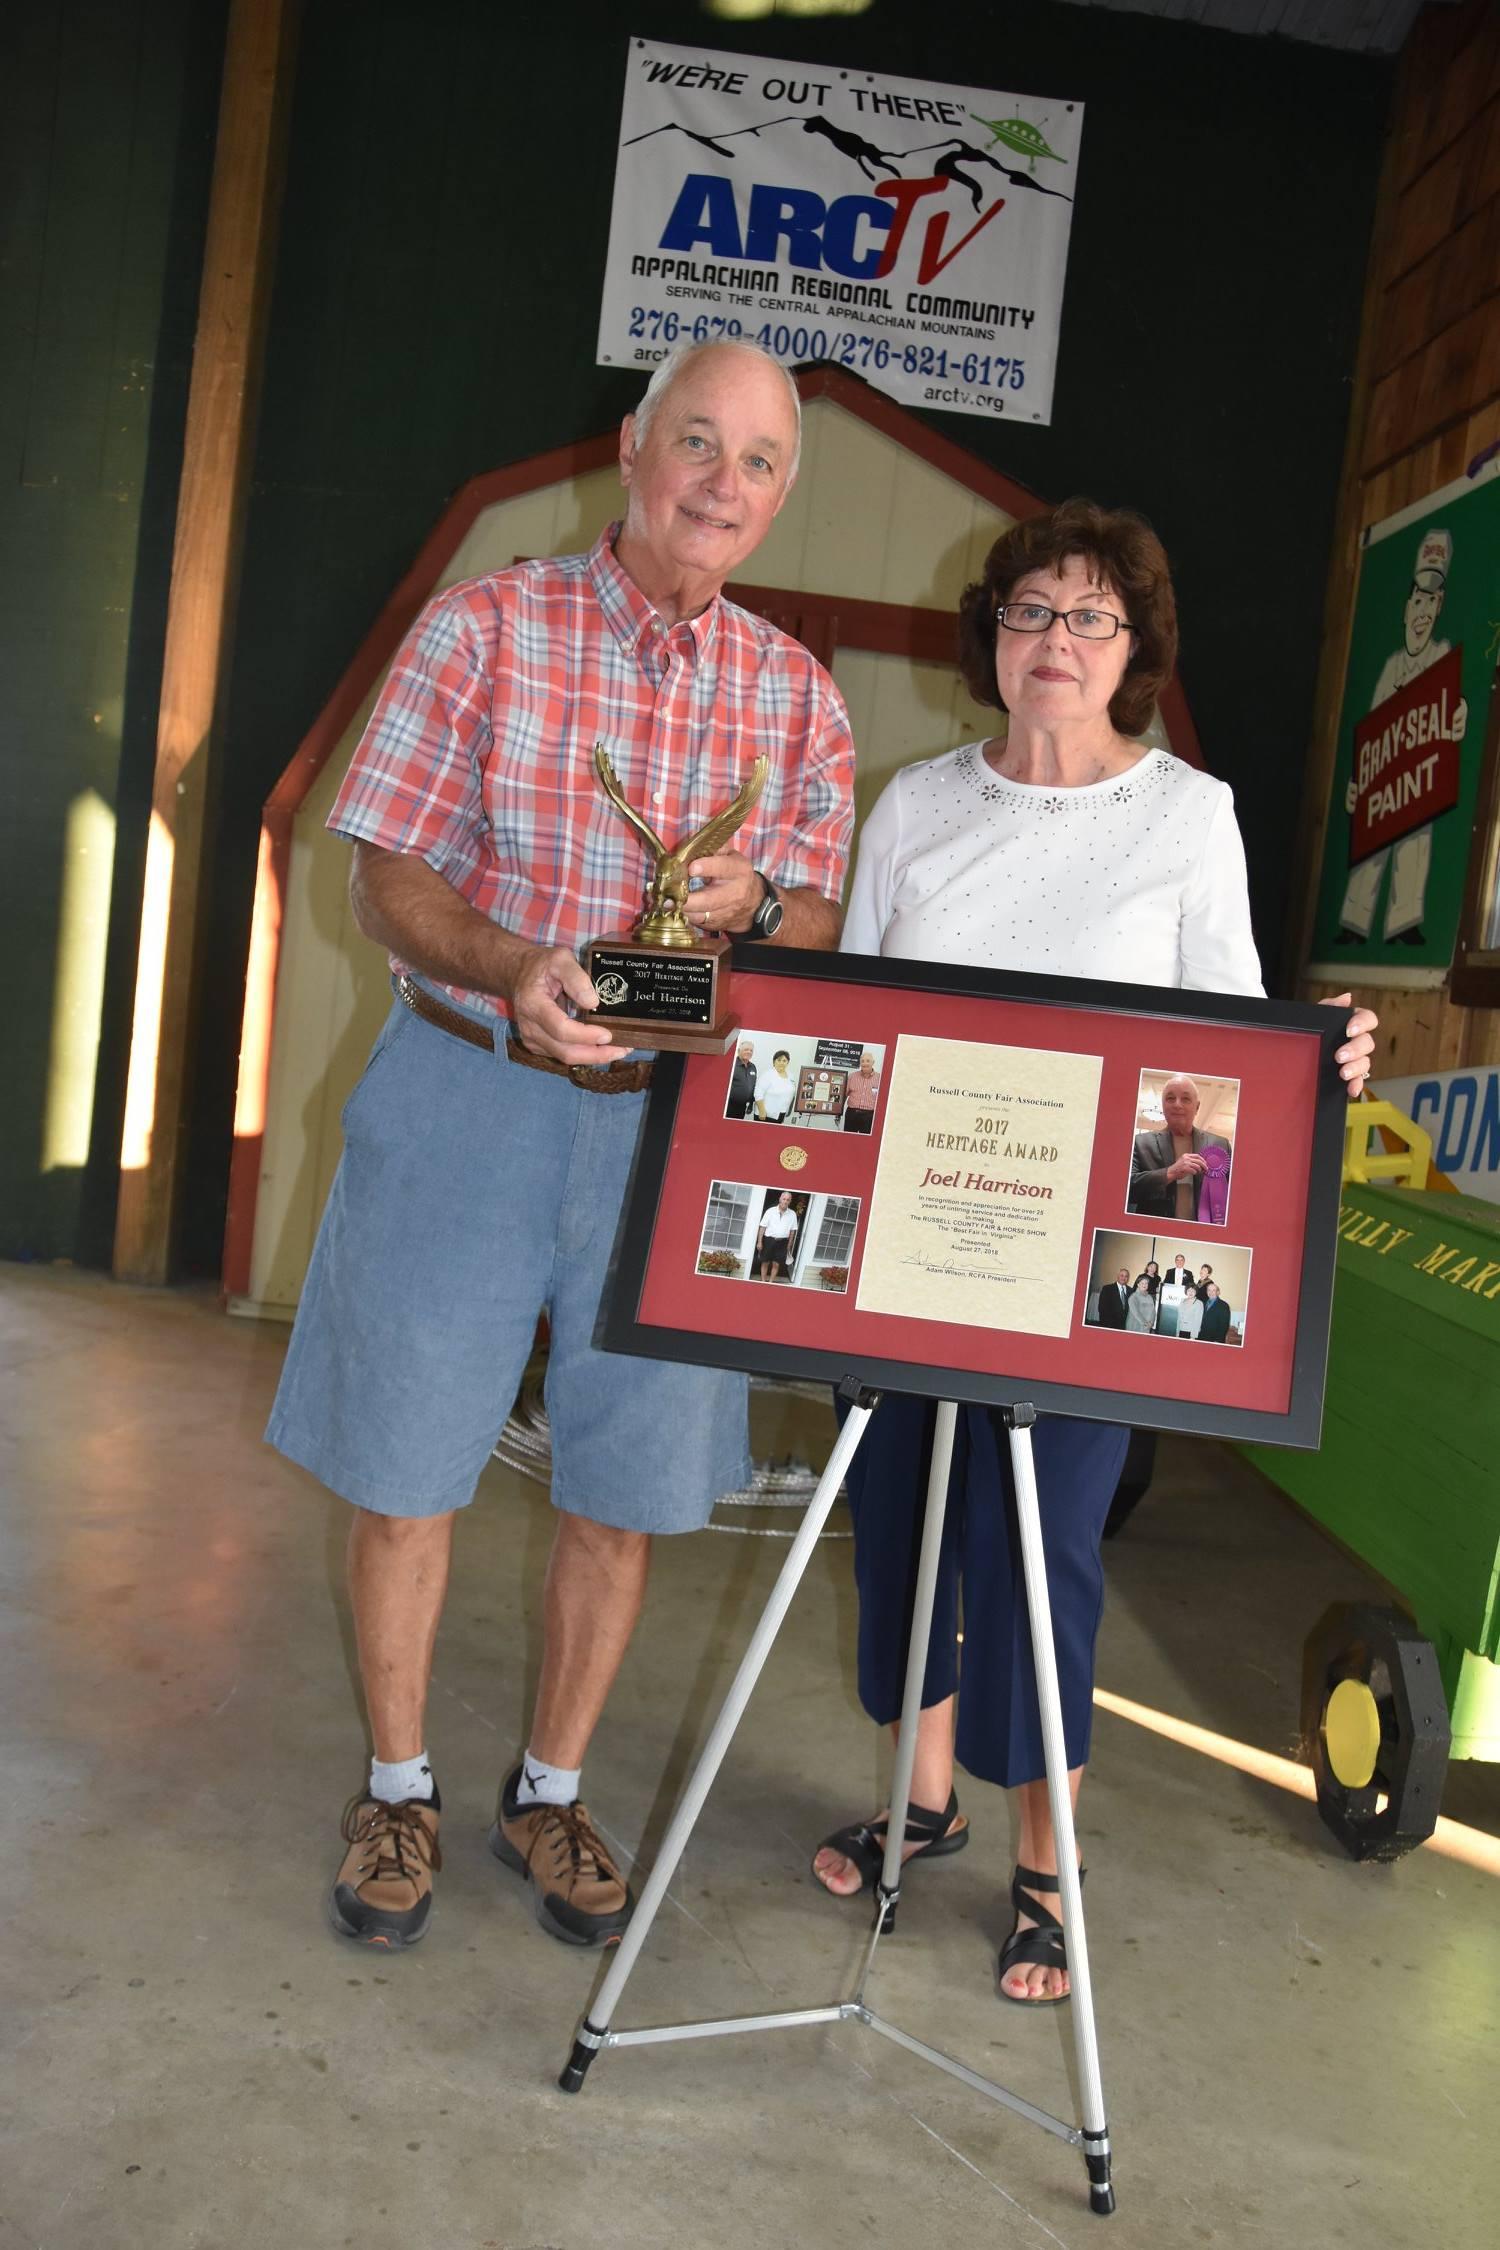 Joel Harrison - Heritage Award